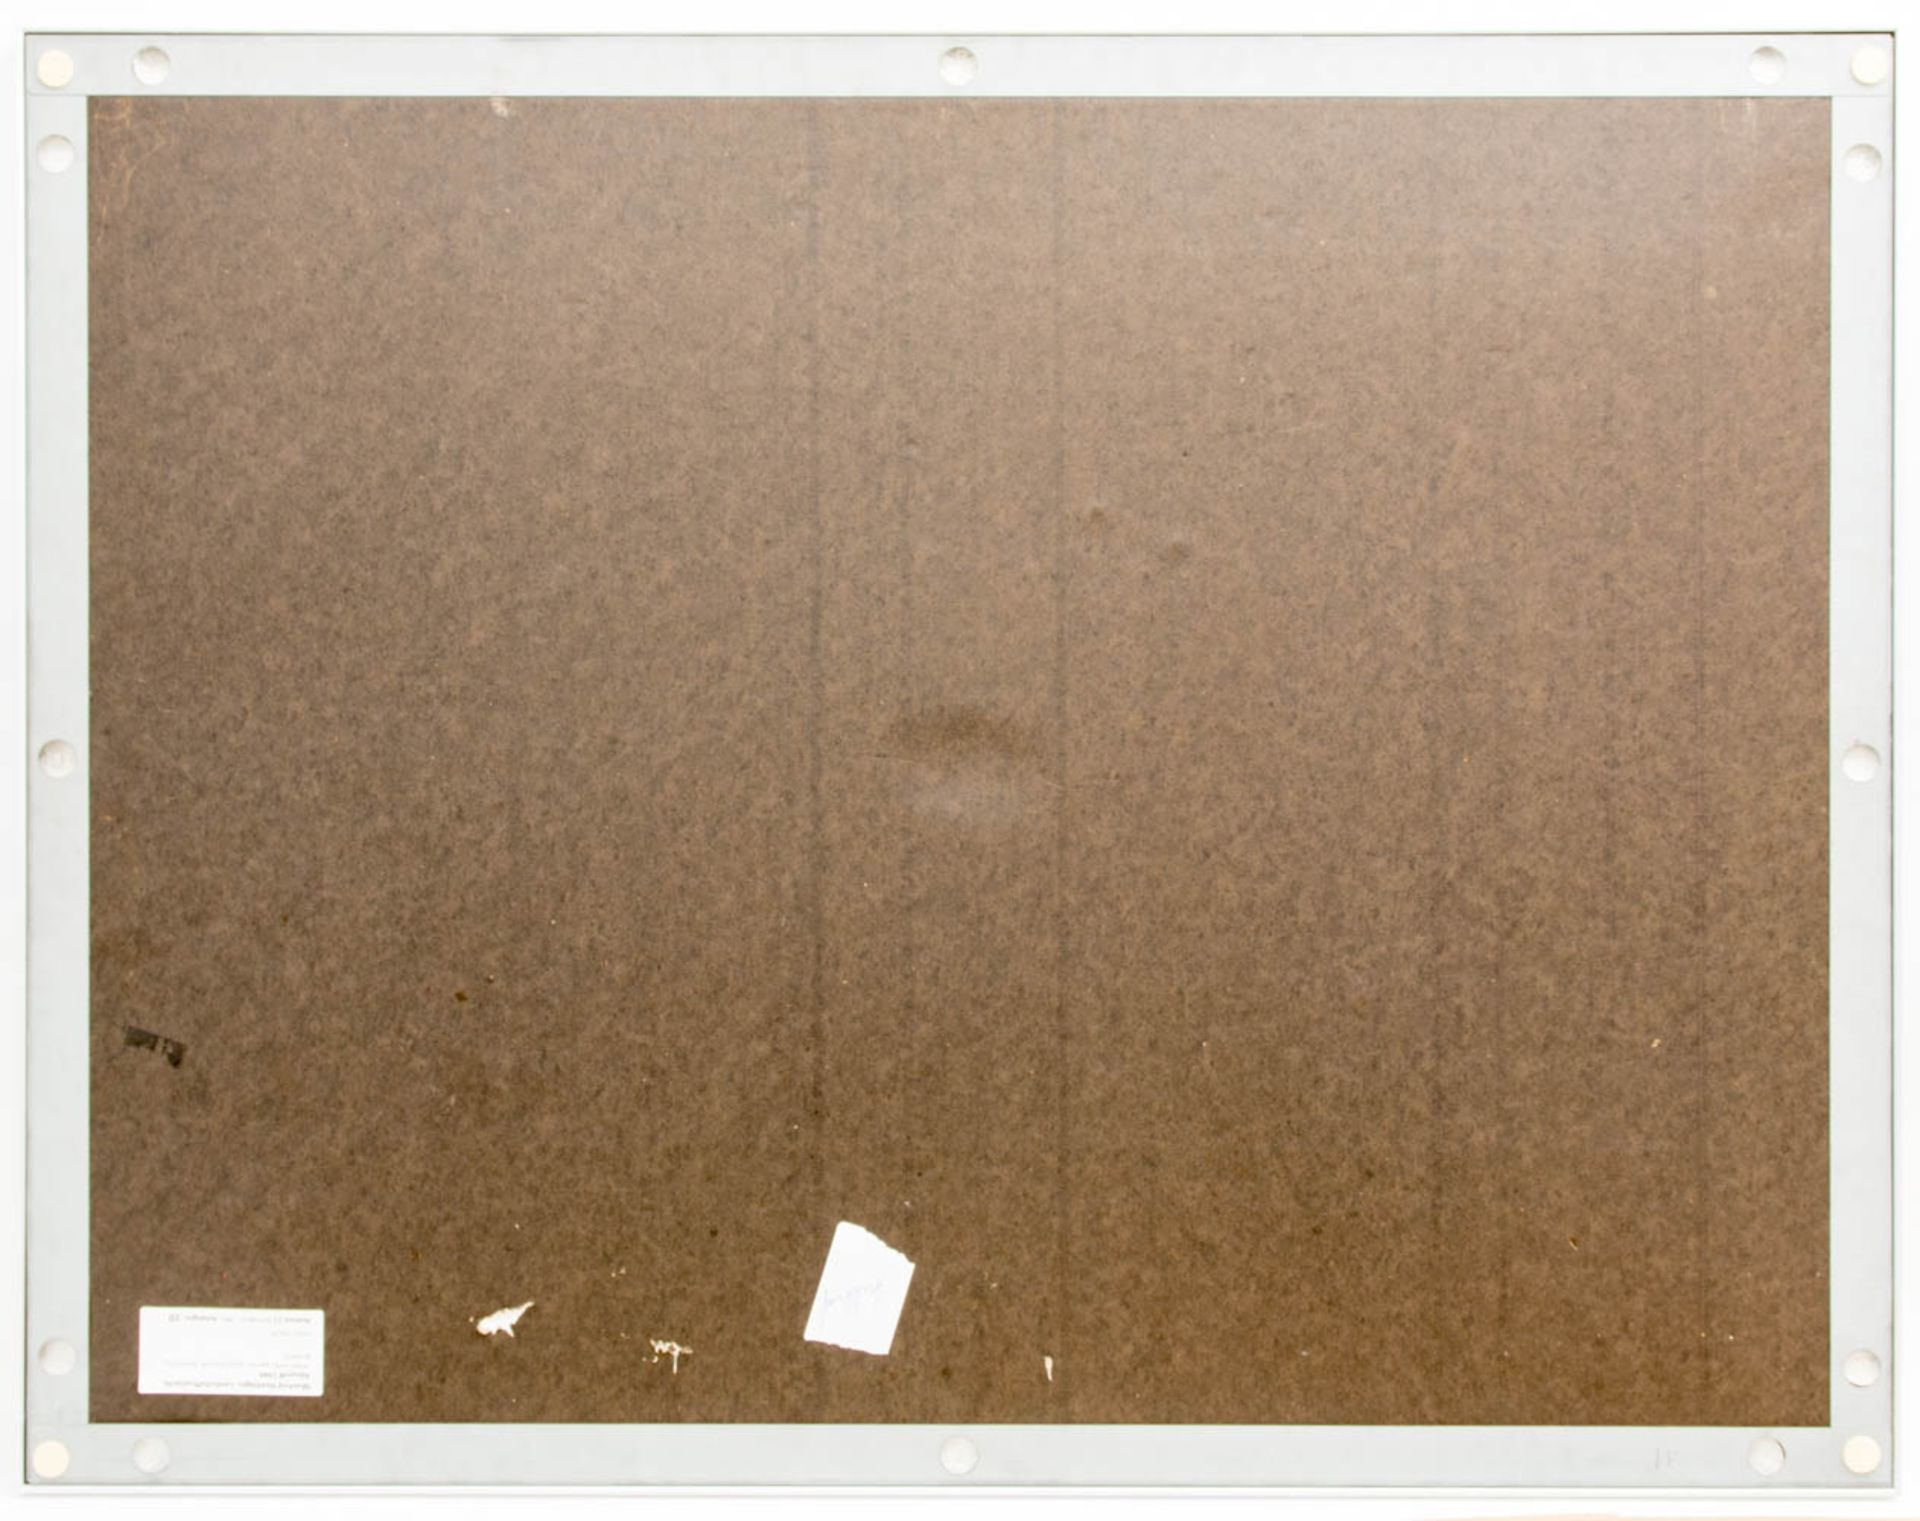 Manfred Henninger, Landschaftsansicht, Aquarell, 1944. - Bild 4 aus 4